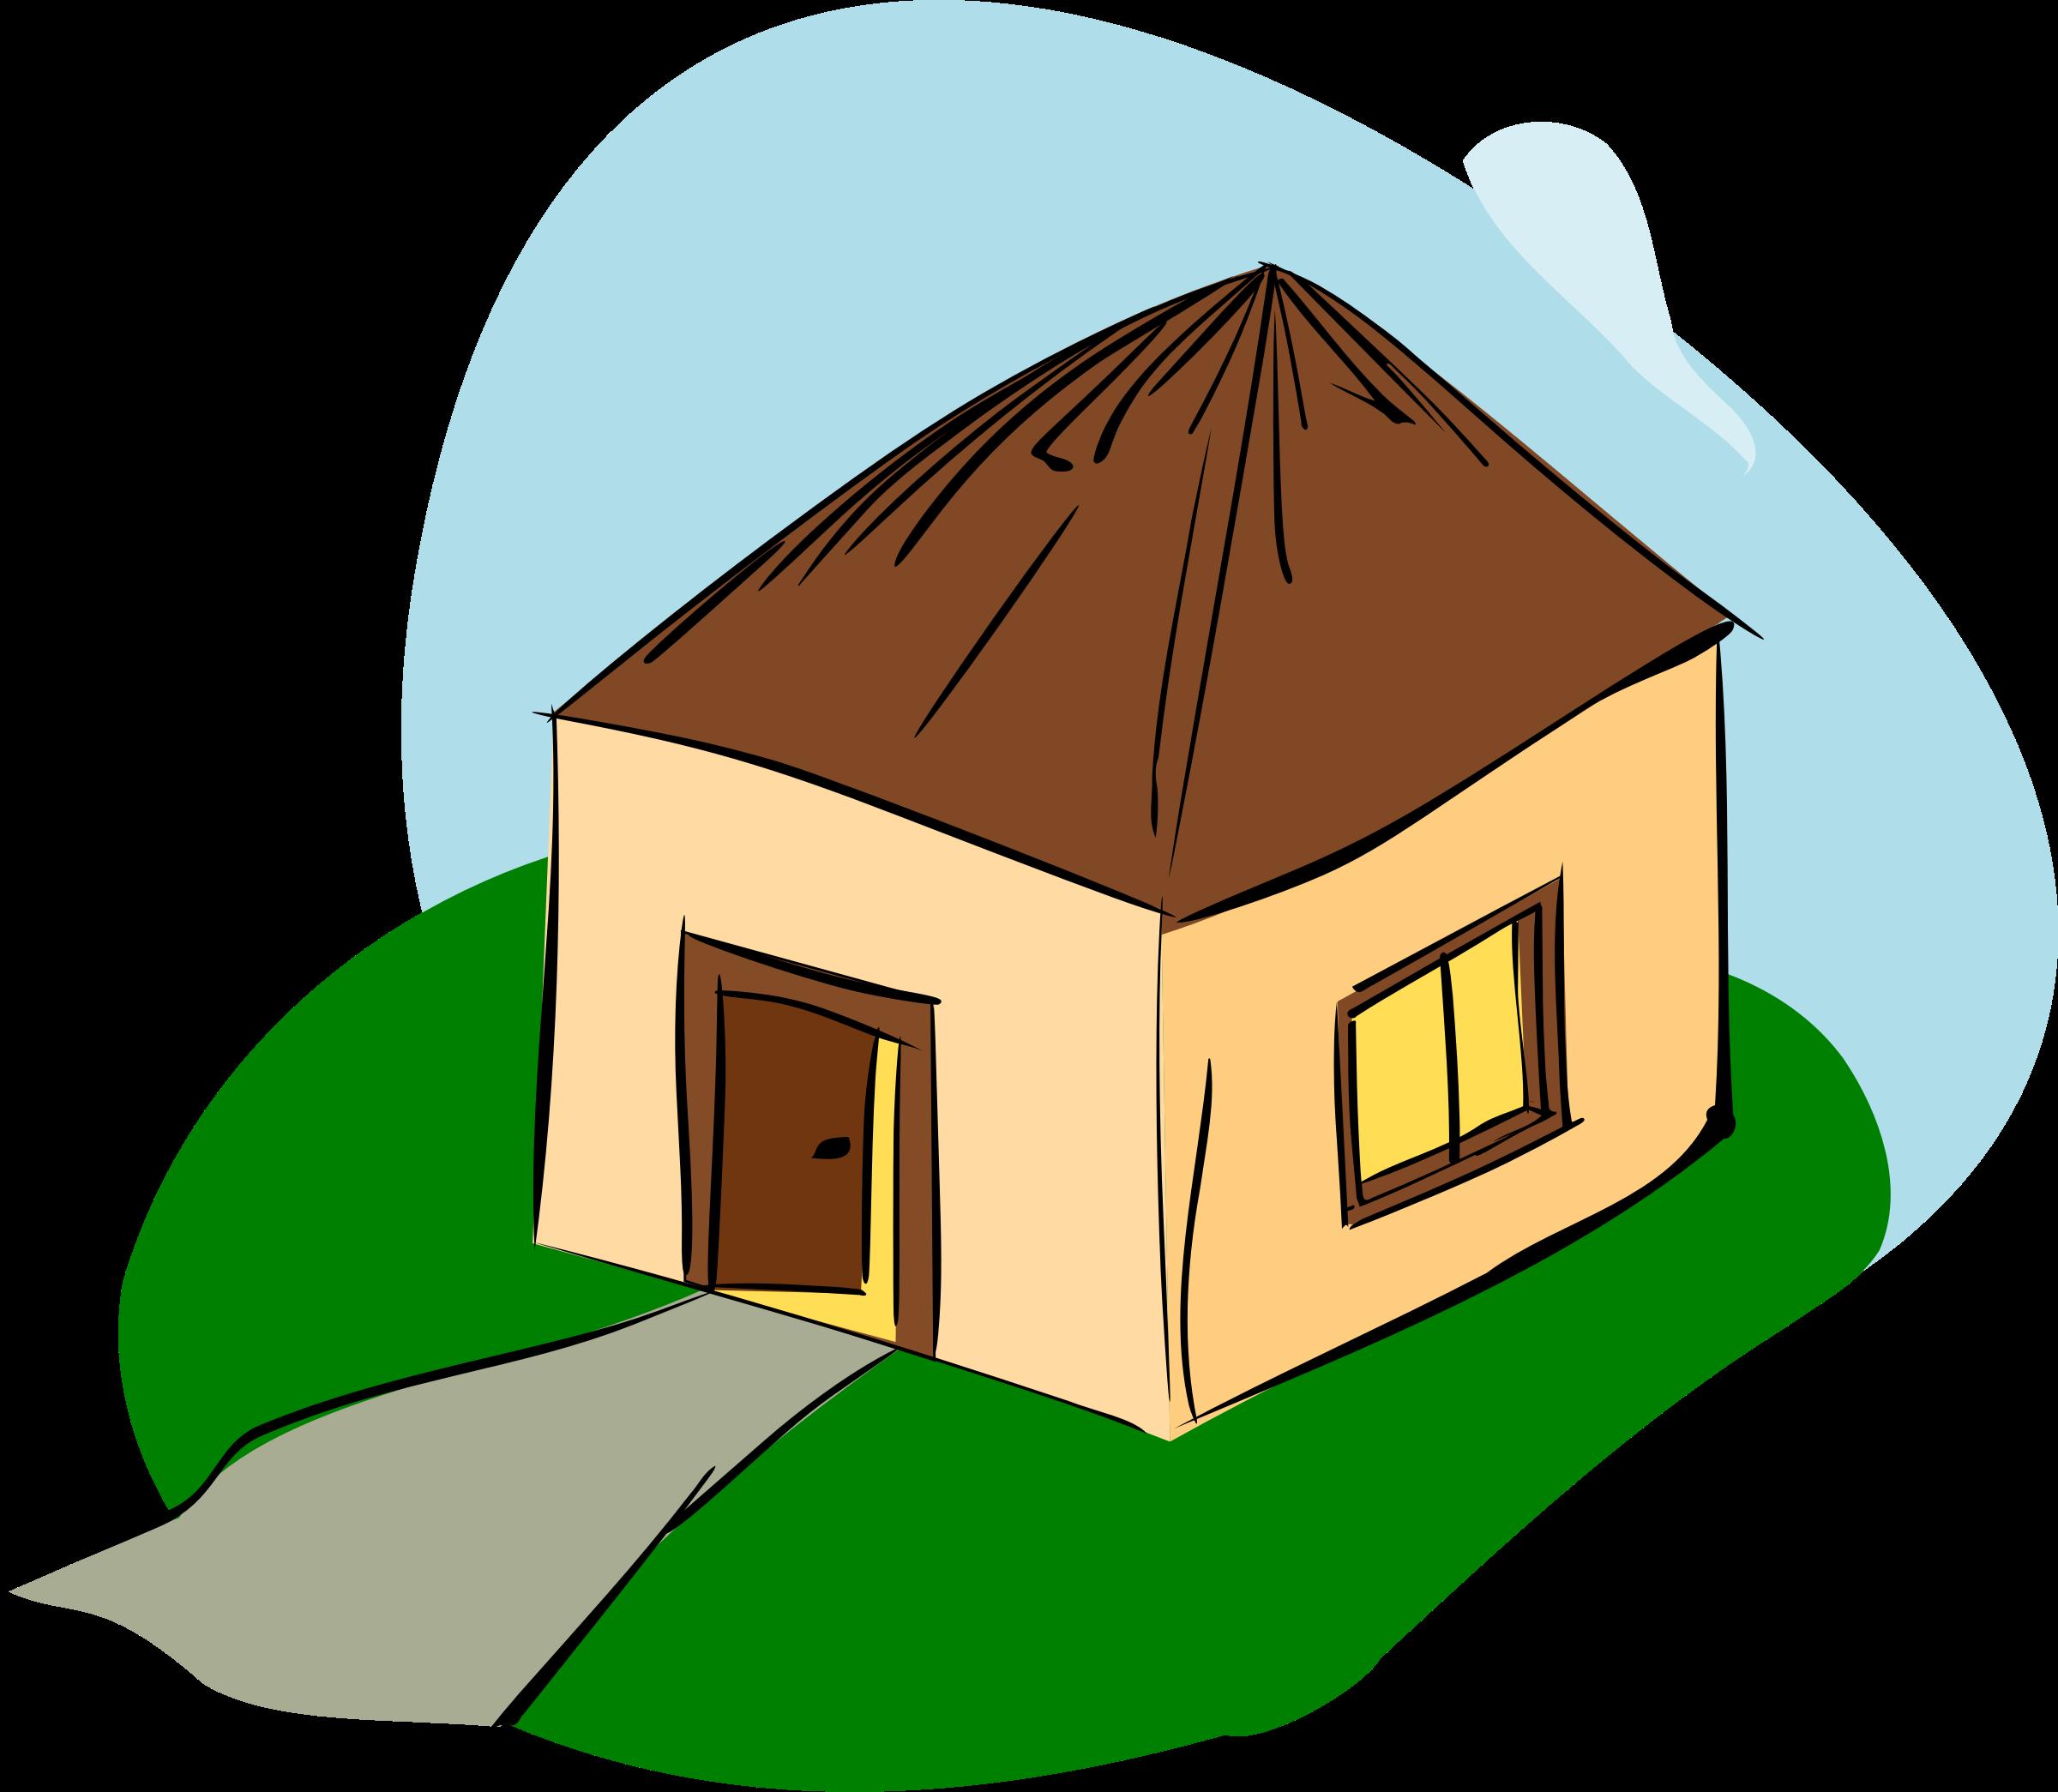 Shack hut pencil and. Explosion clipart cartoon house